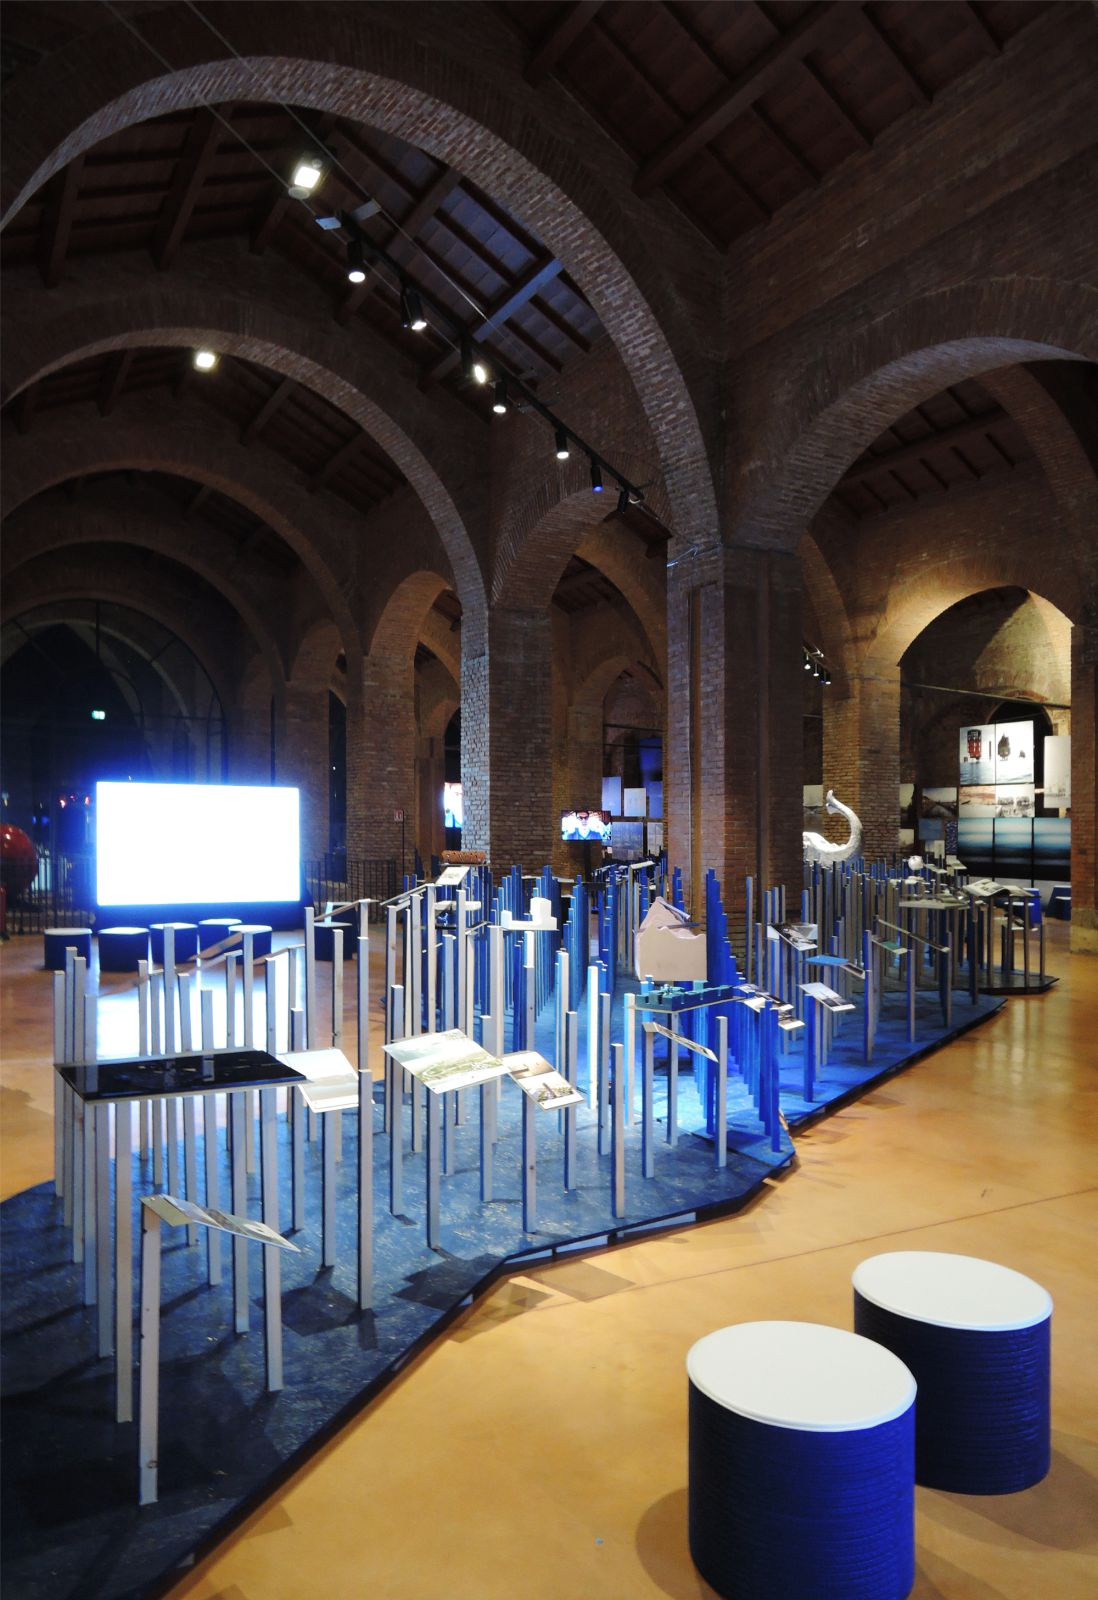 Pisa Architecture Biennale